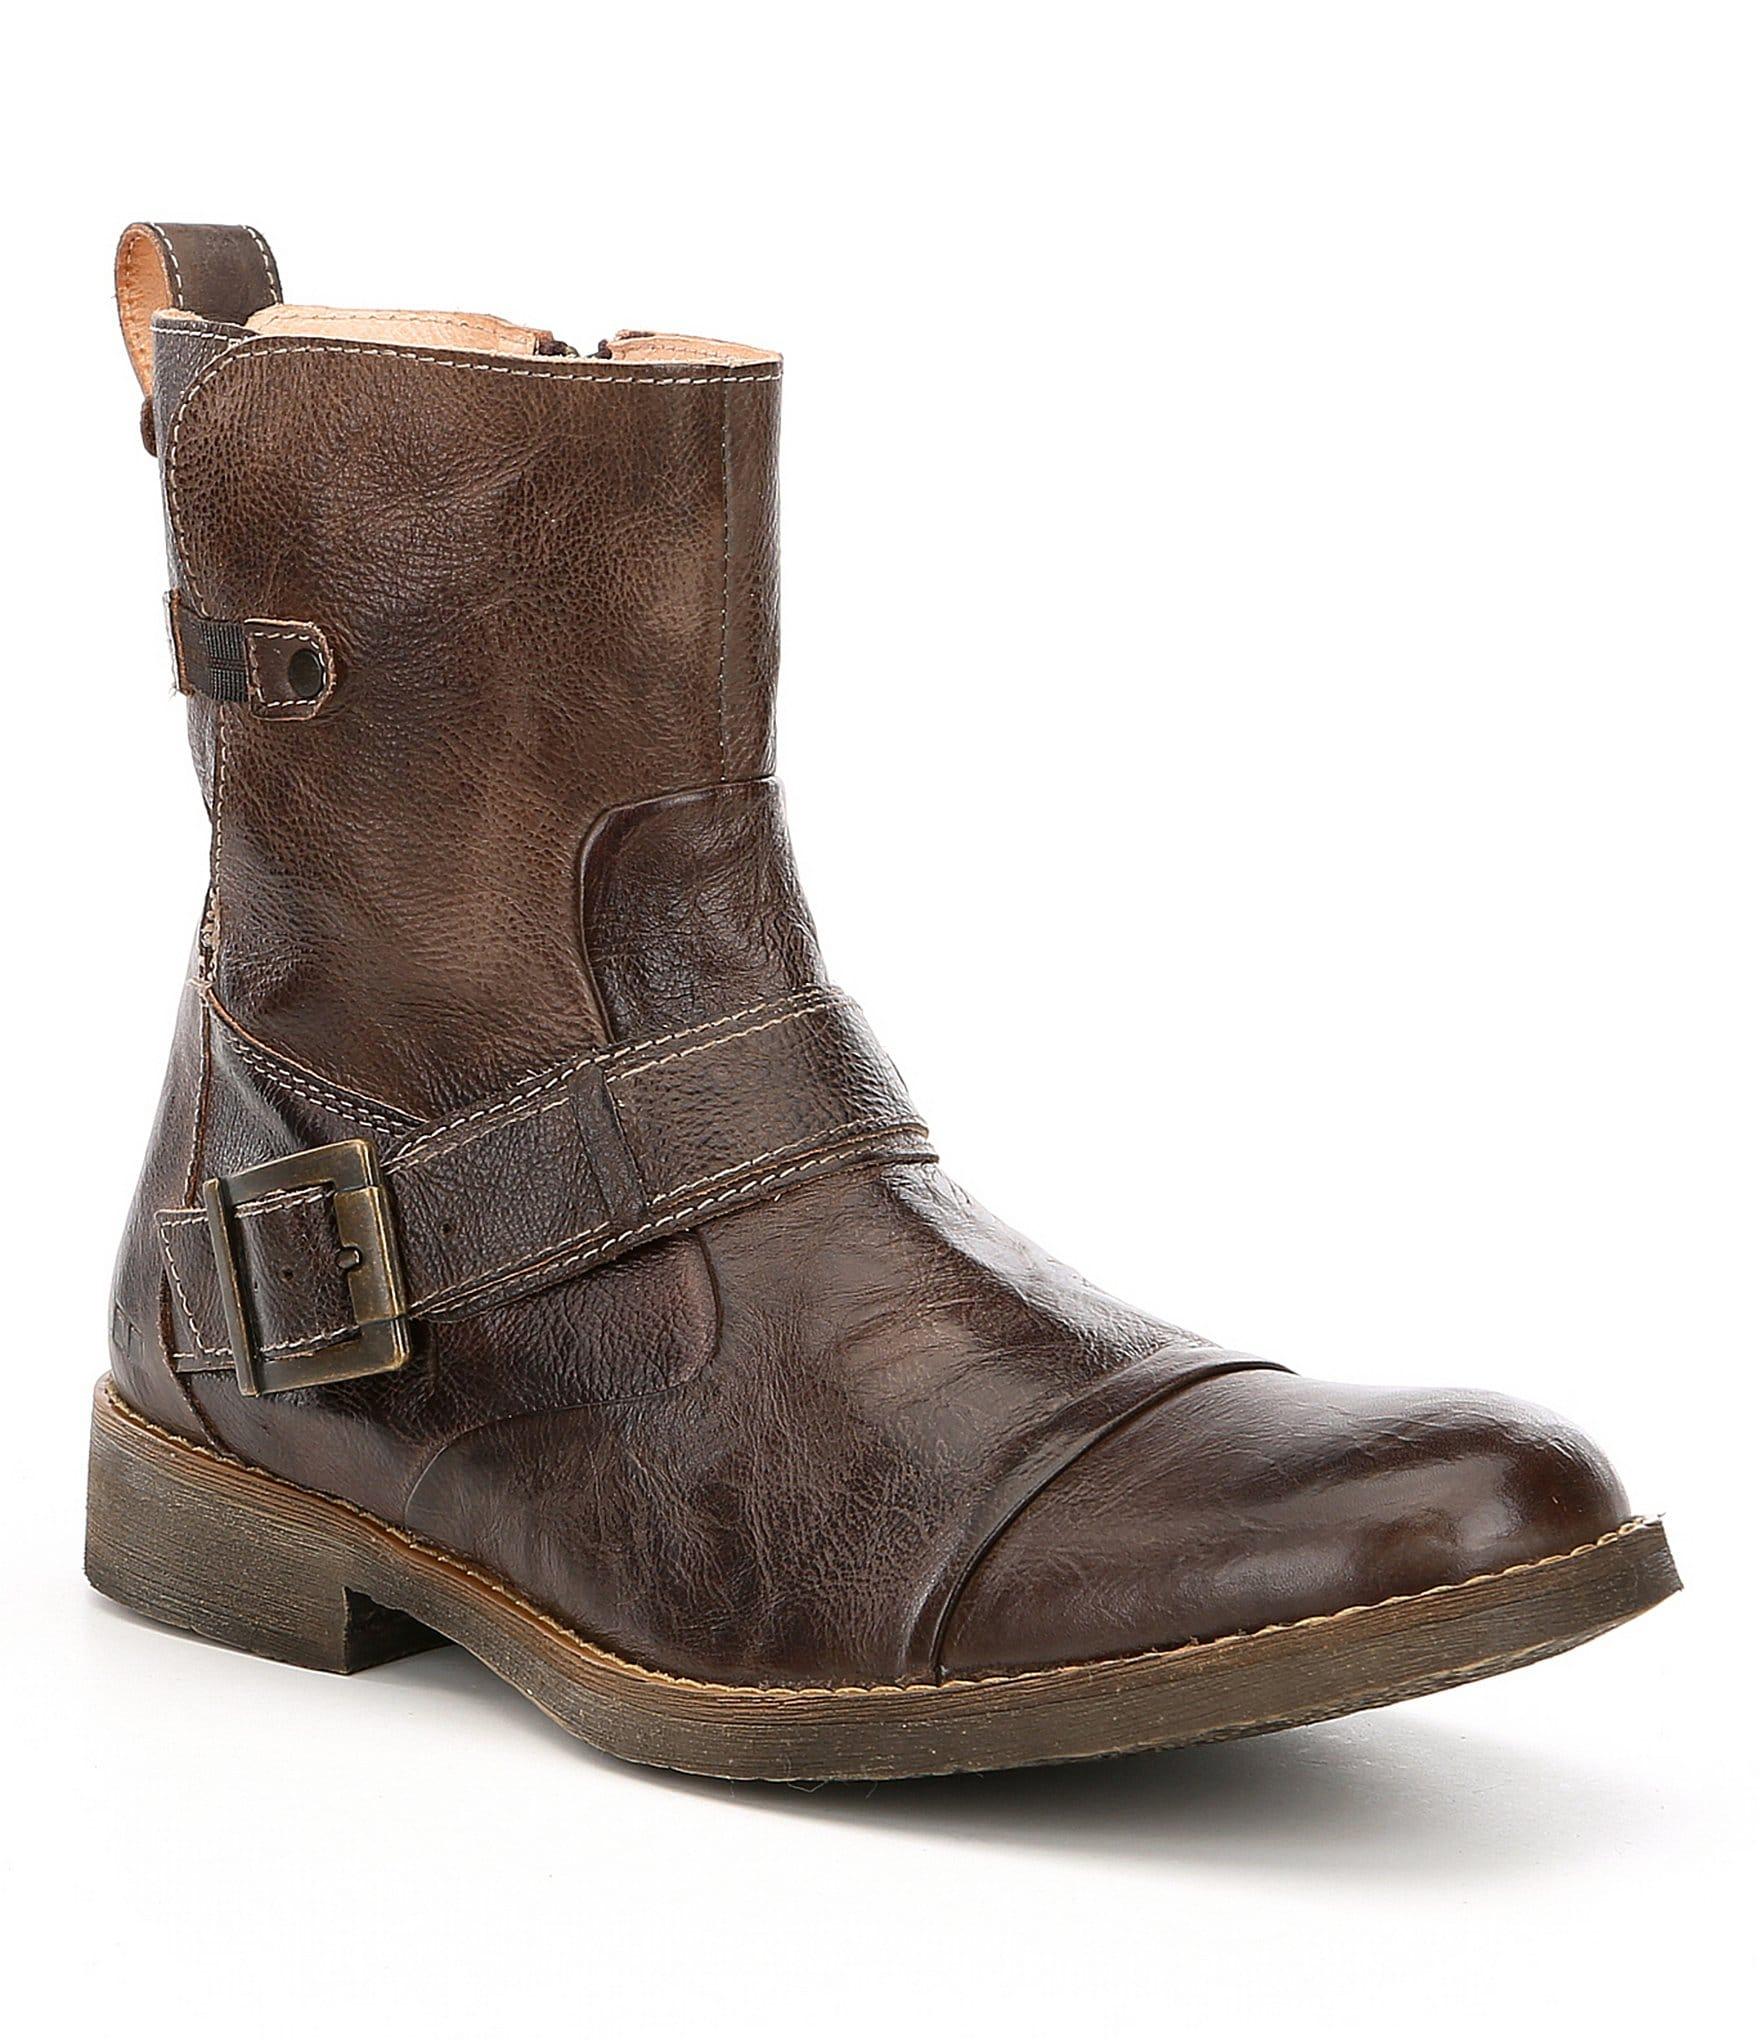 Bed Stu Mens Shoes